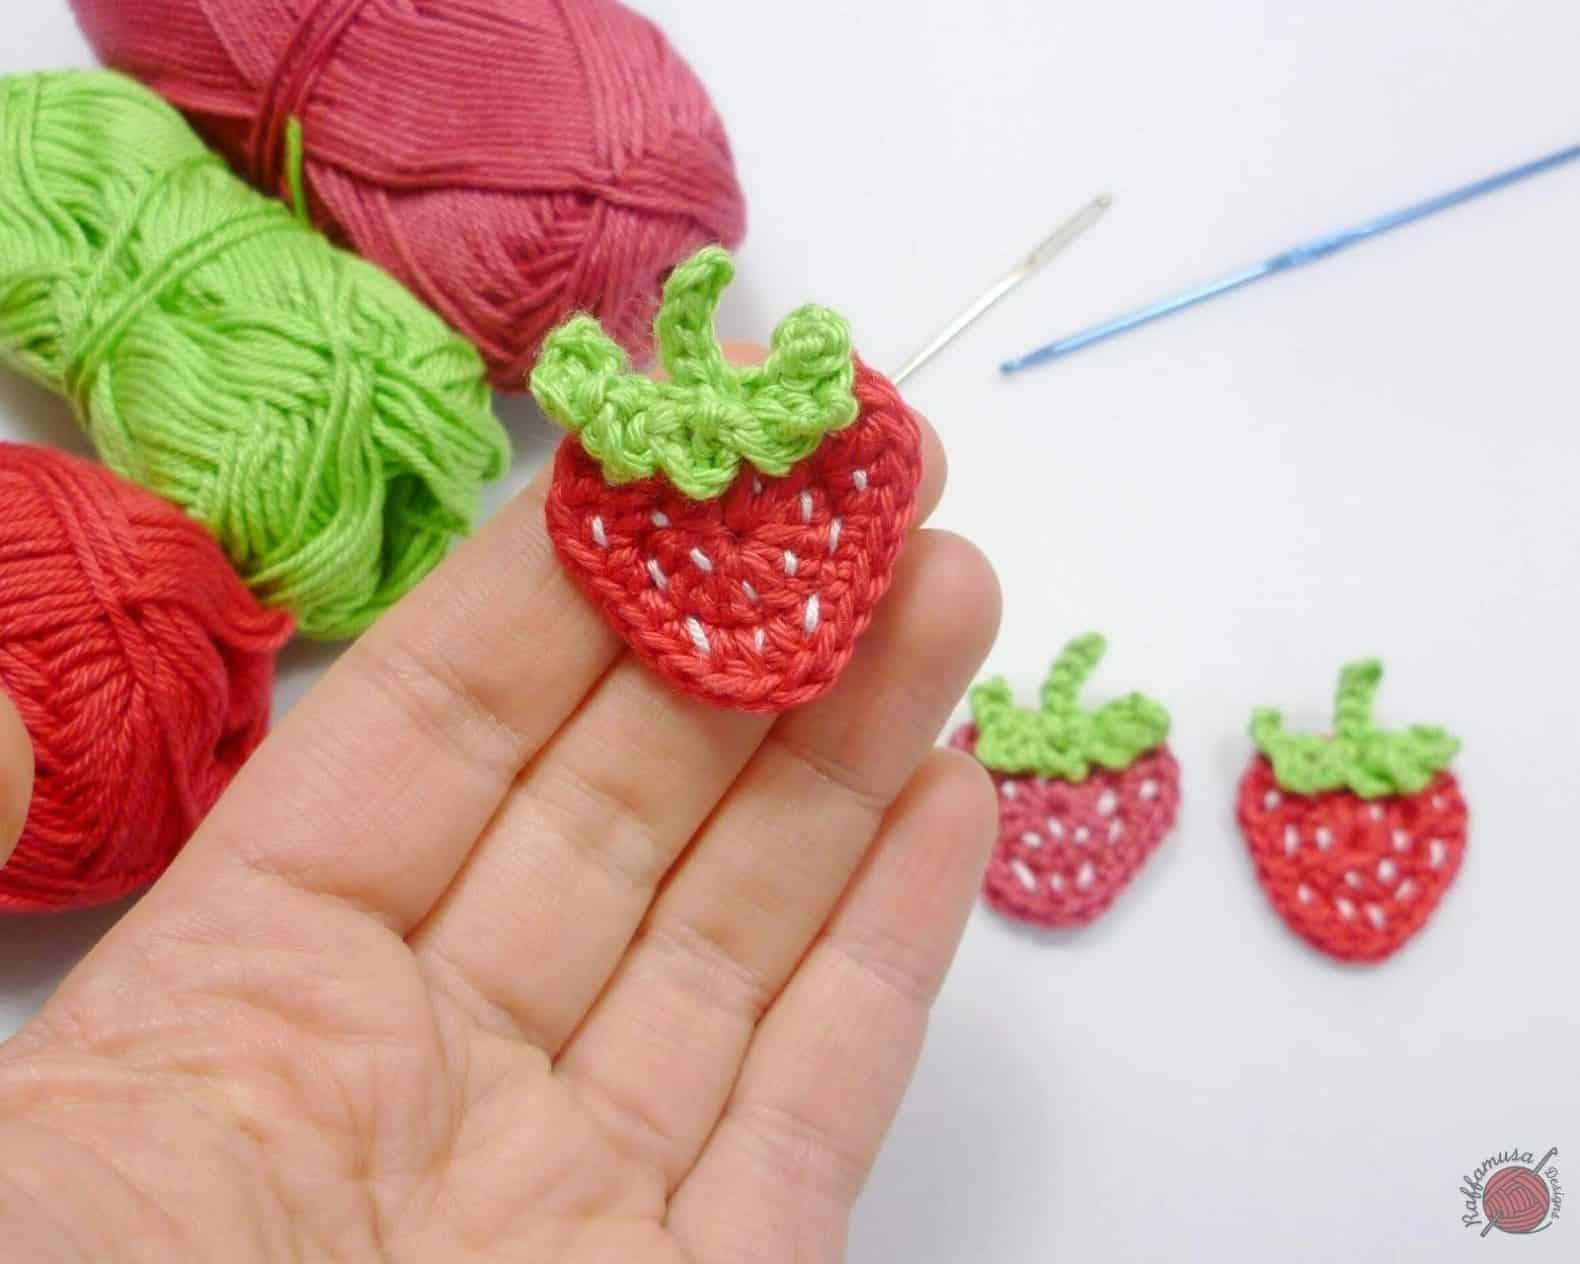 Tiny Crochet Strawberry Applique - a free crochet pattern.